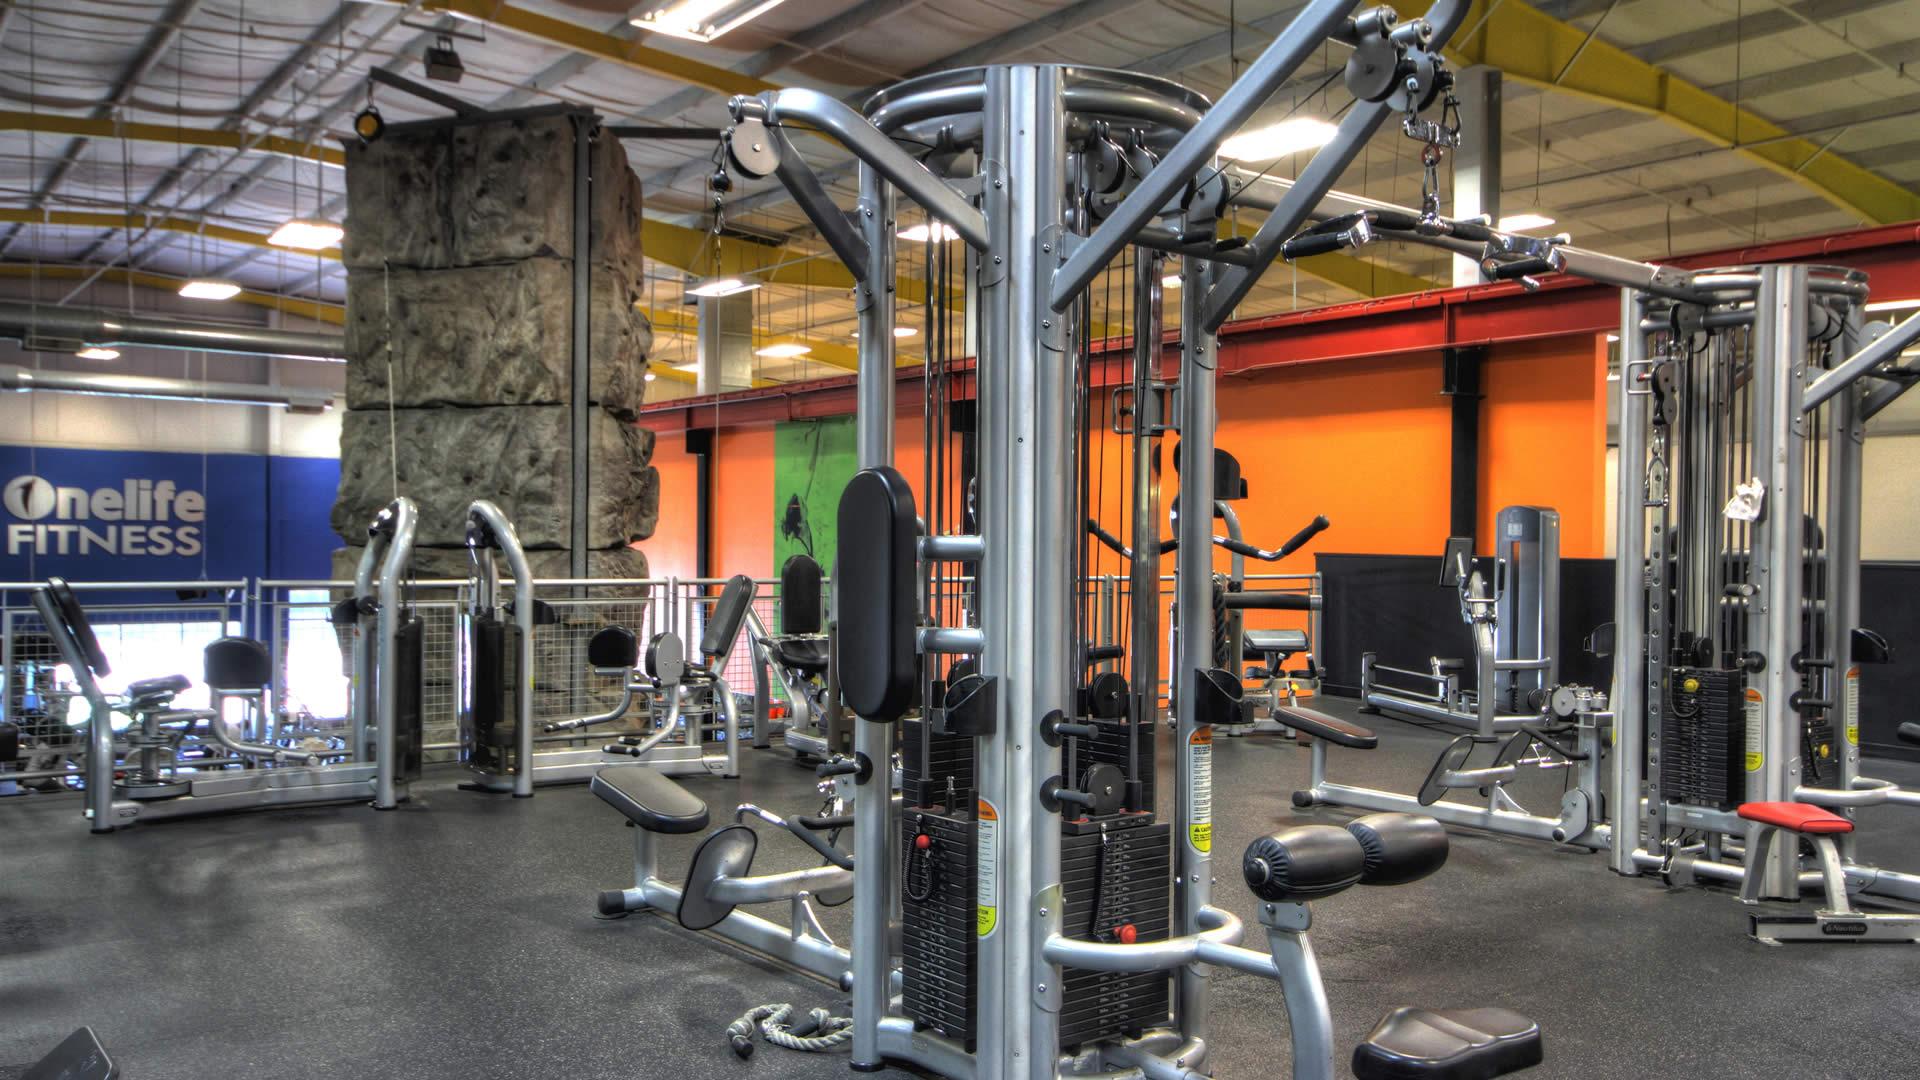 Newport News Gym